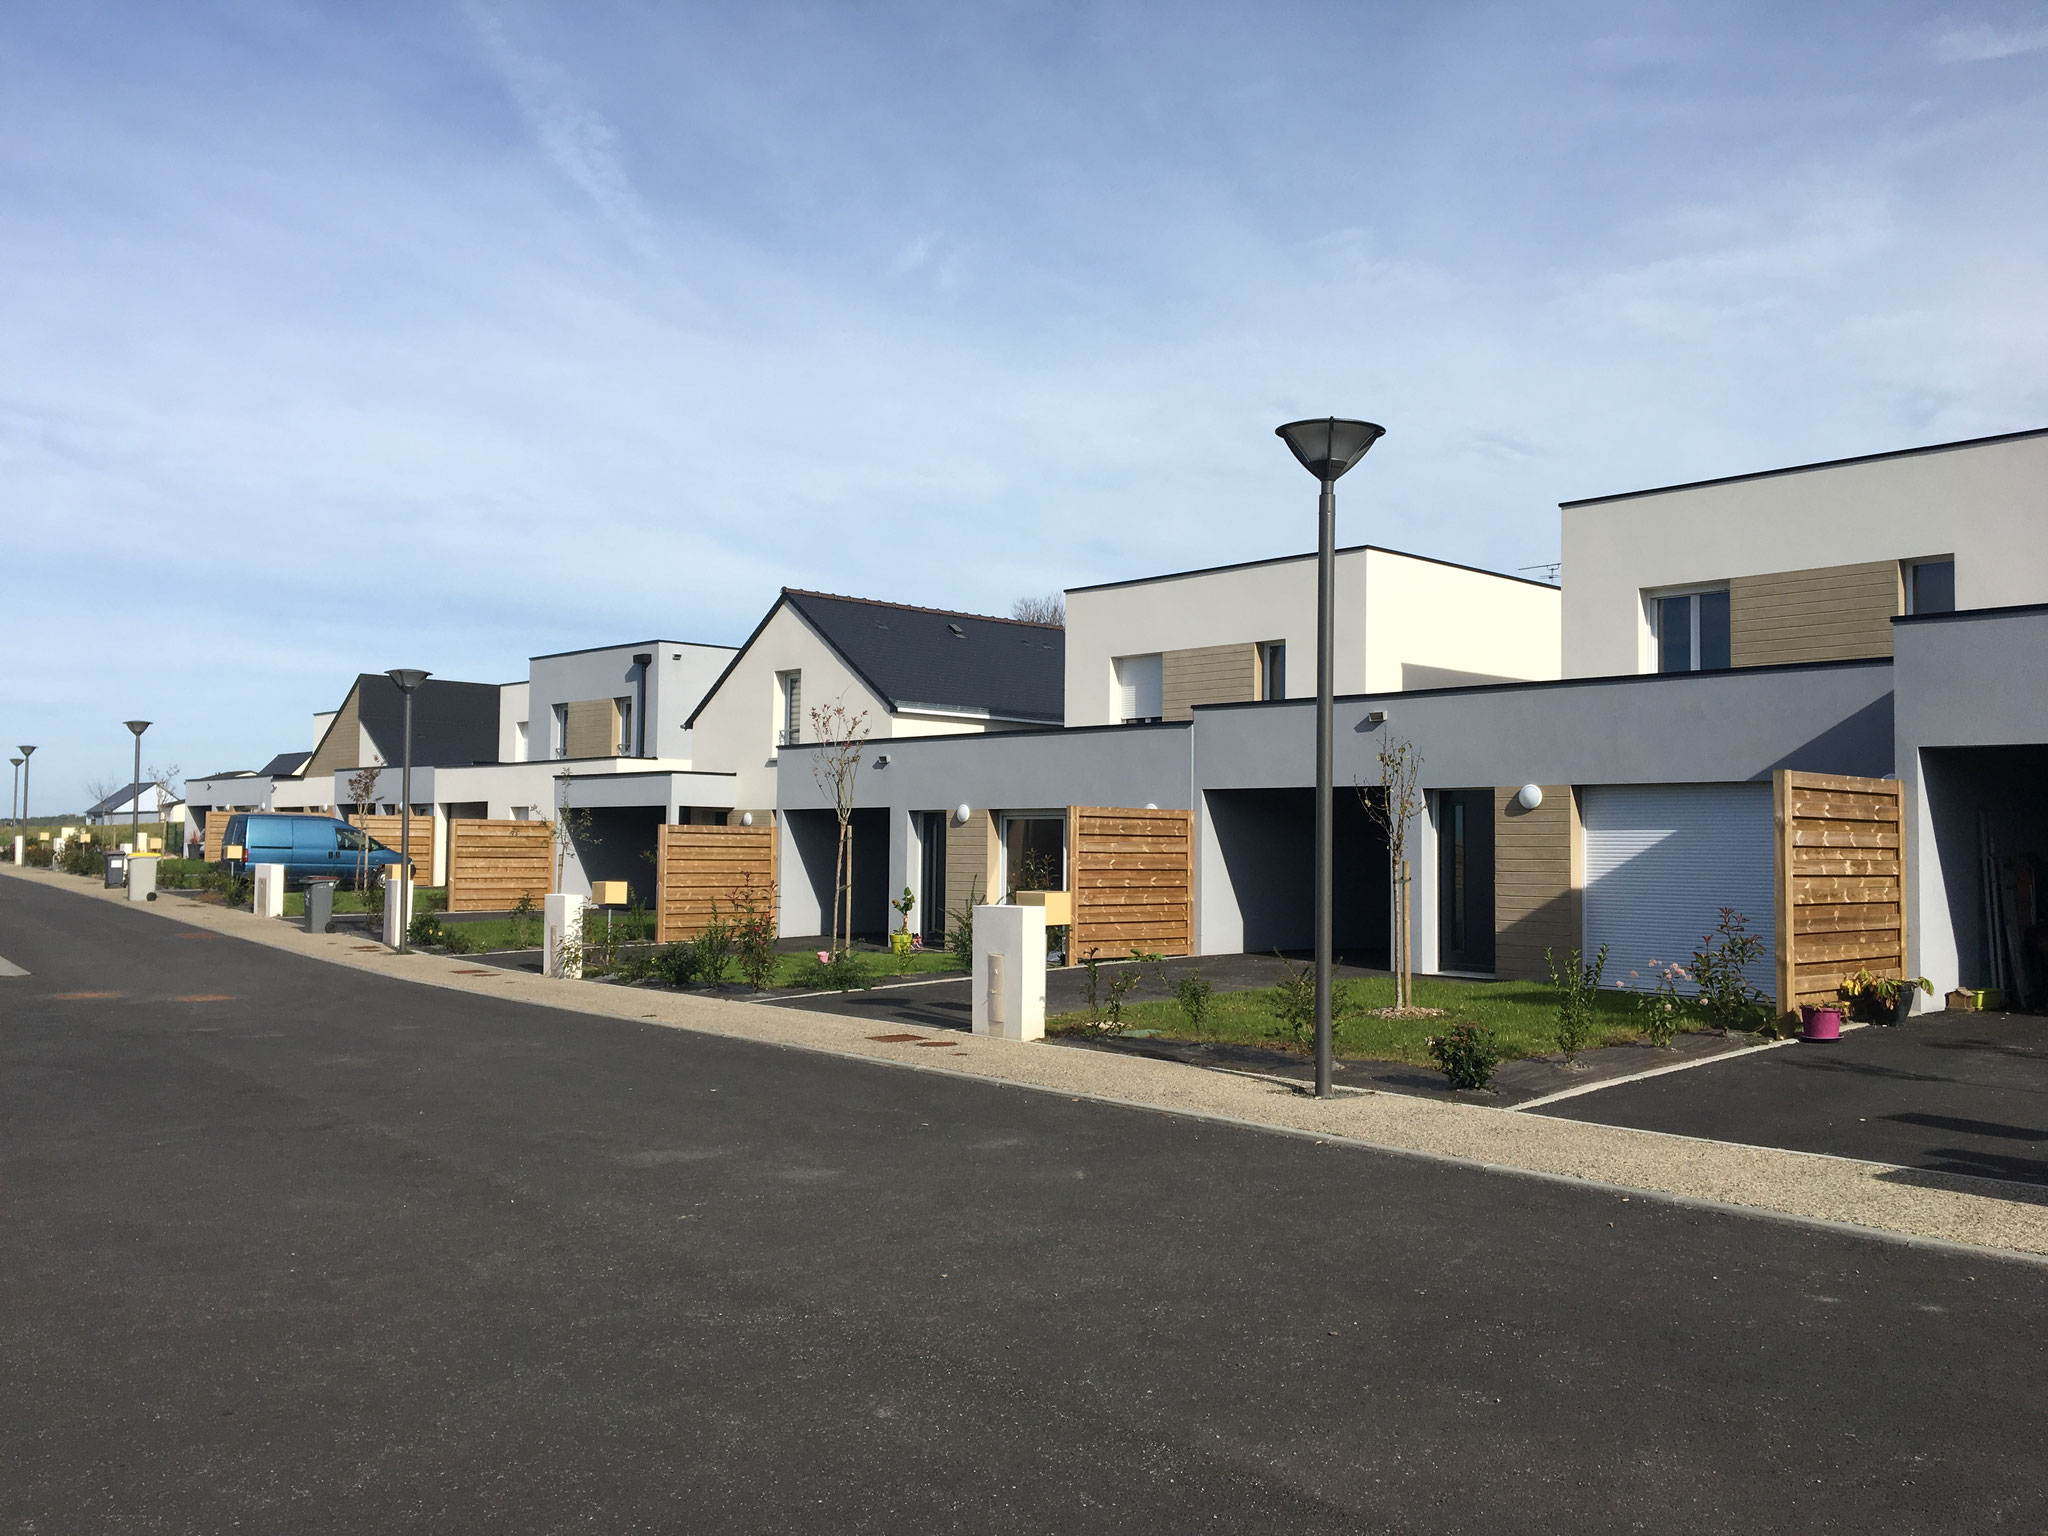 Villas Les Tamaris (COOPALIS) 16 logements en accession sociale